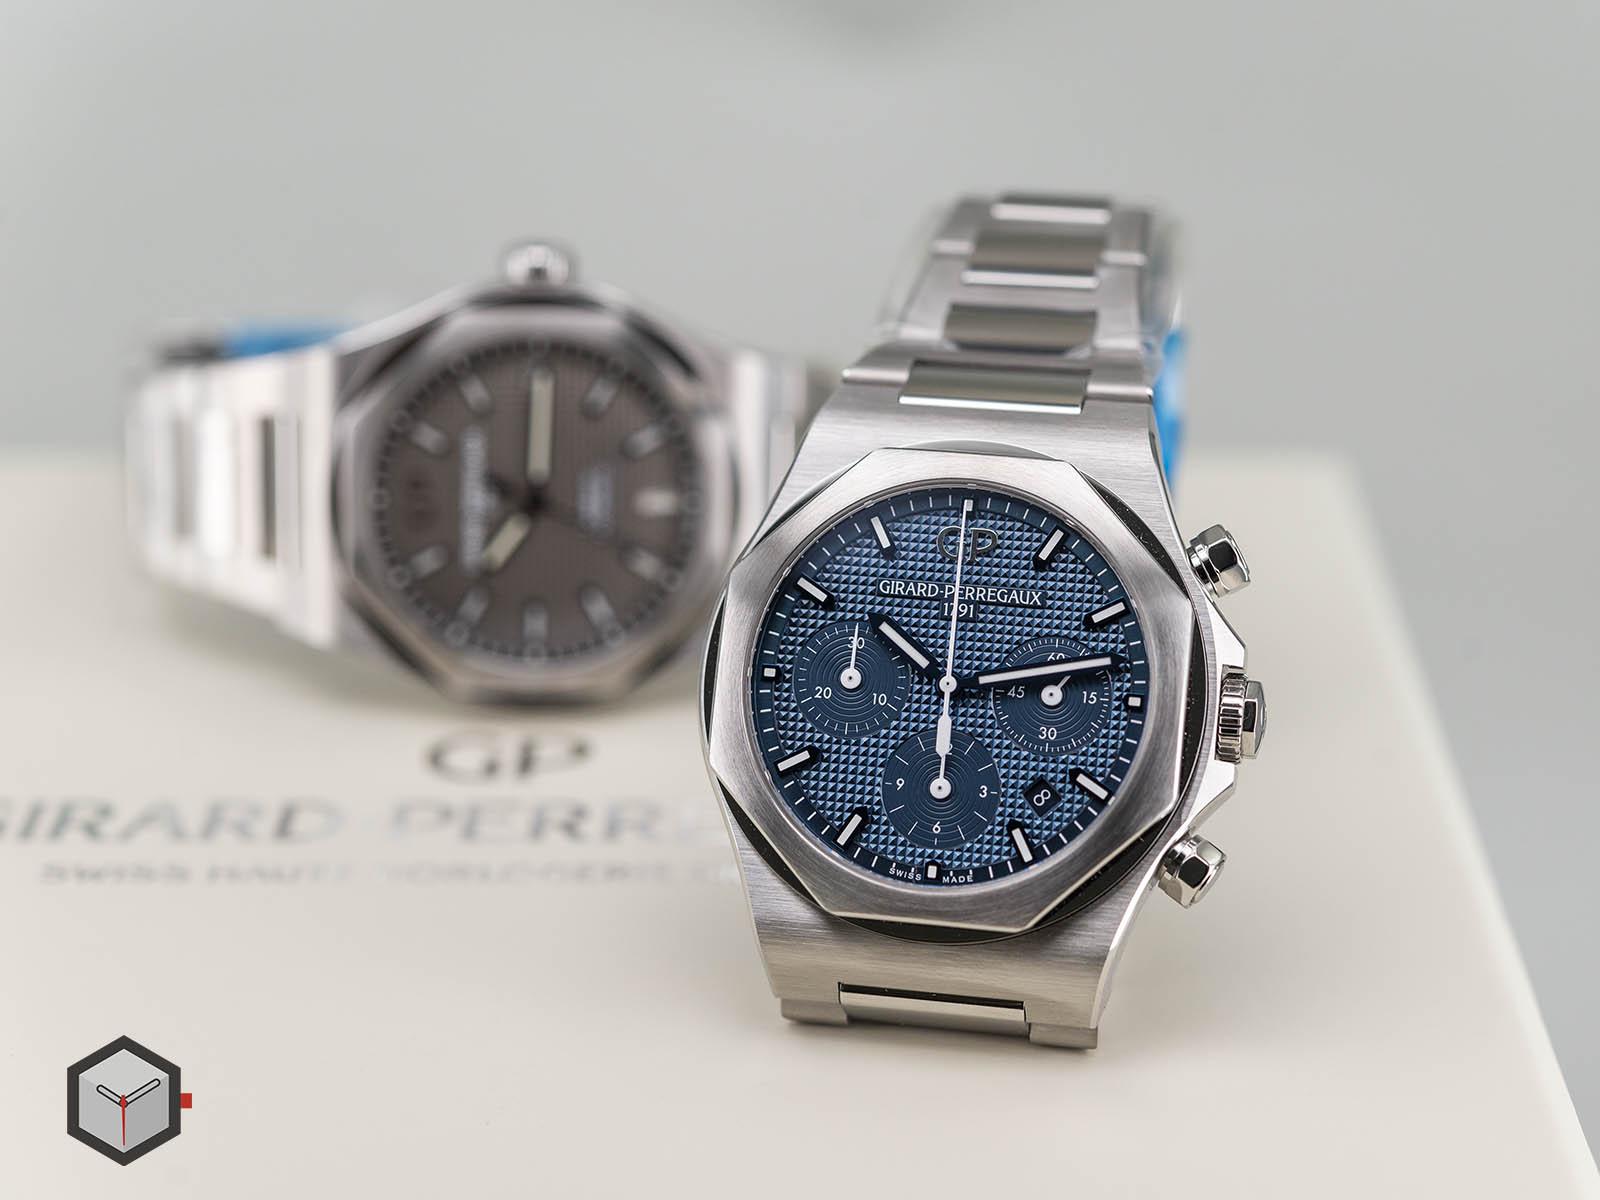 girard-perregaux-laureato-chronograph-42-mm-6.jpg